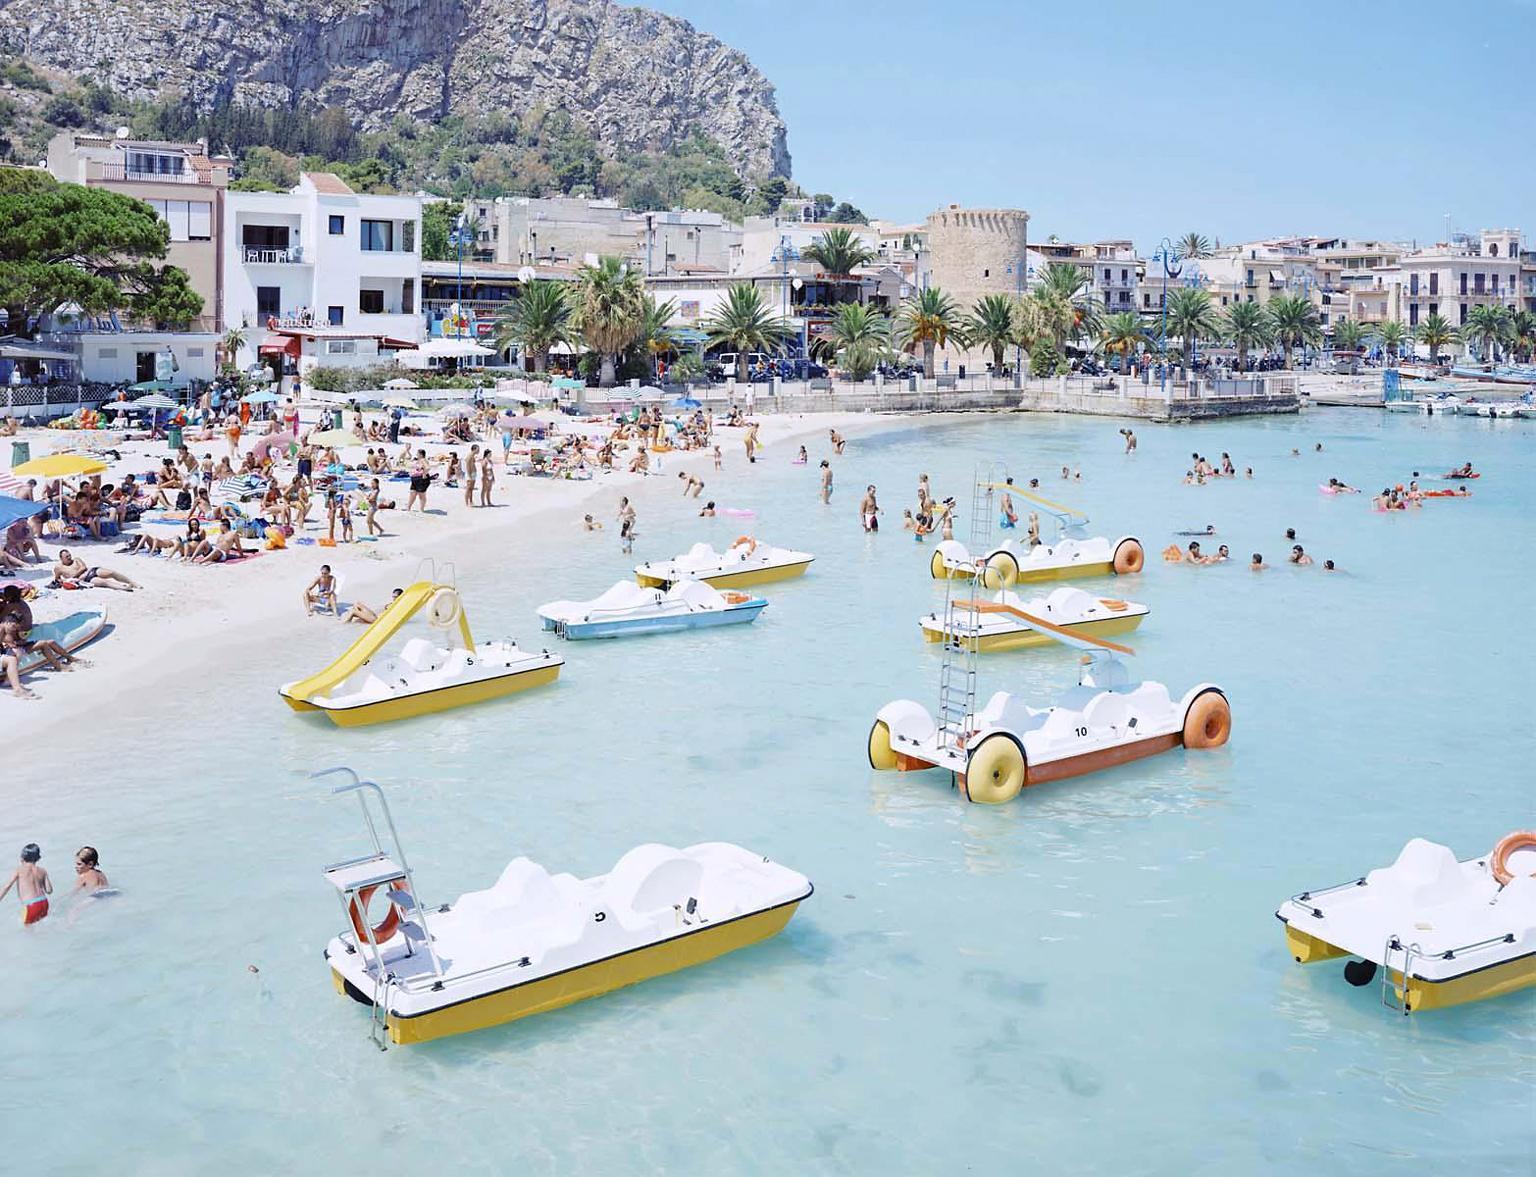 Mondello Paddle Boats - iconic Mediterranean summer beach scene (artist framed)